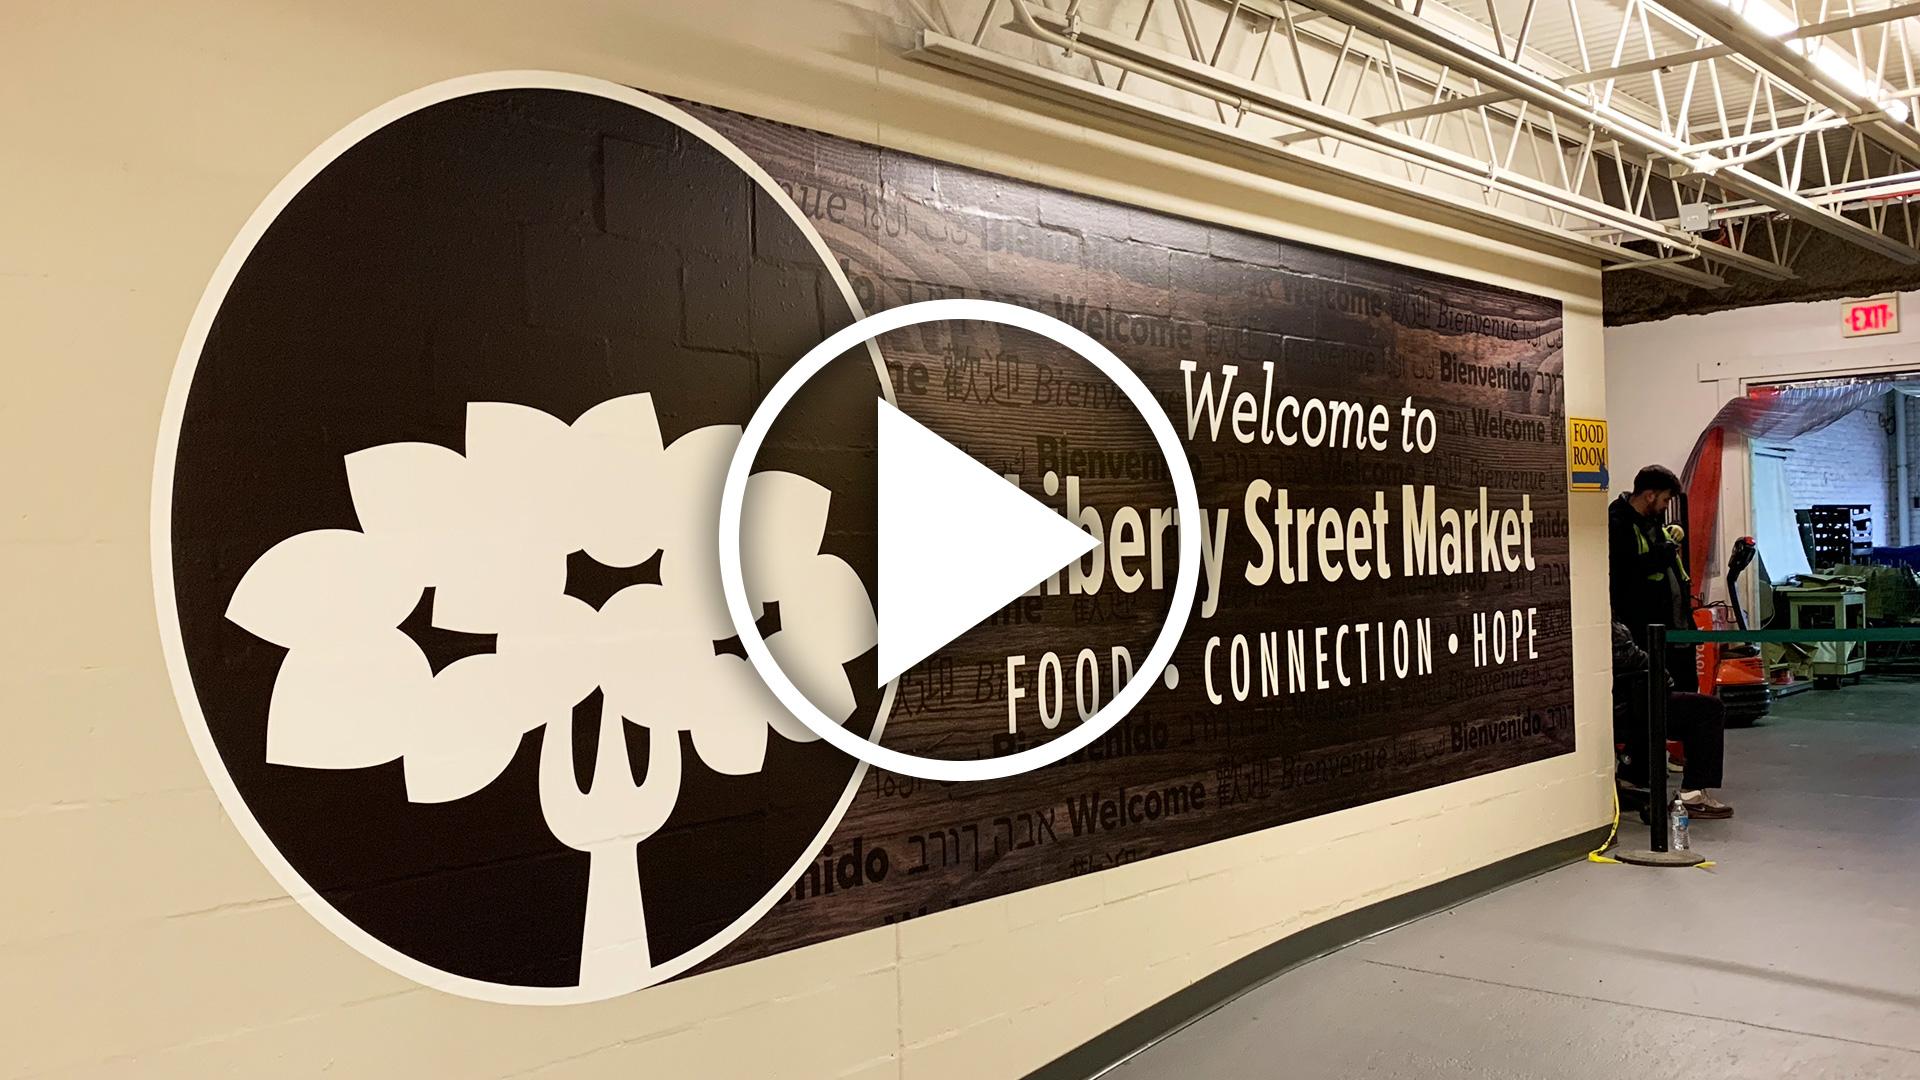 Liberty Street Market Entrance Wall Install